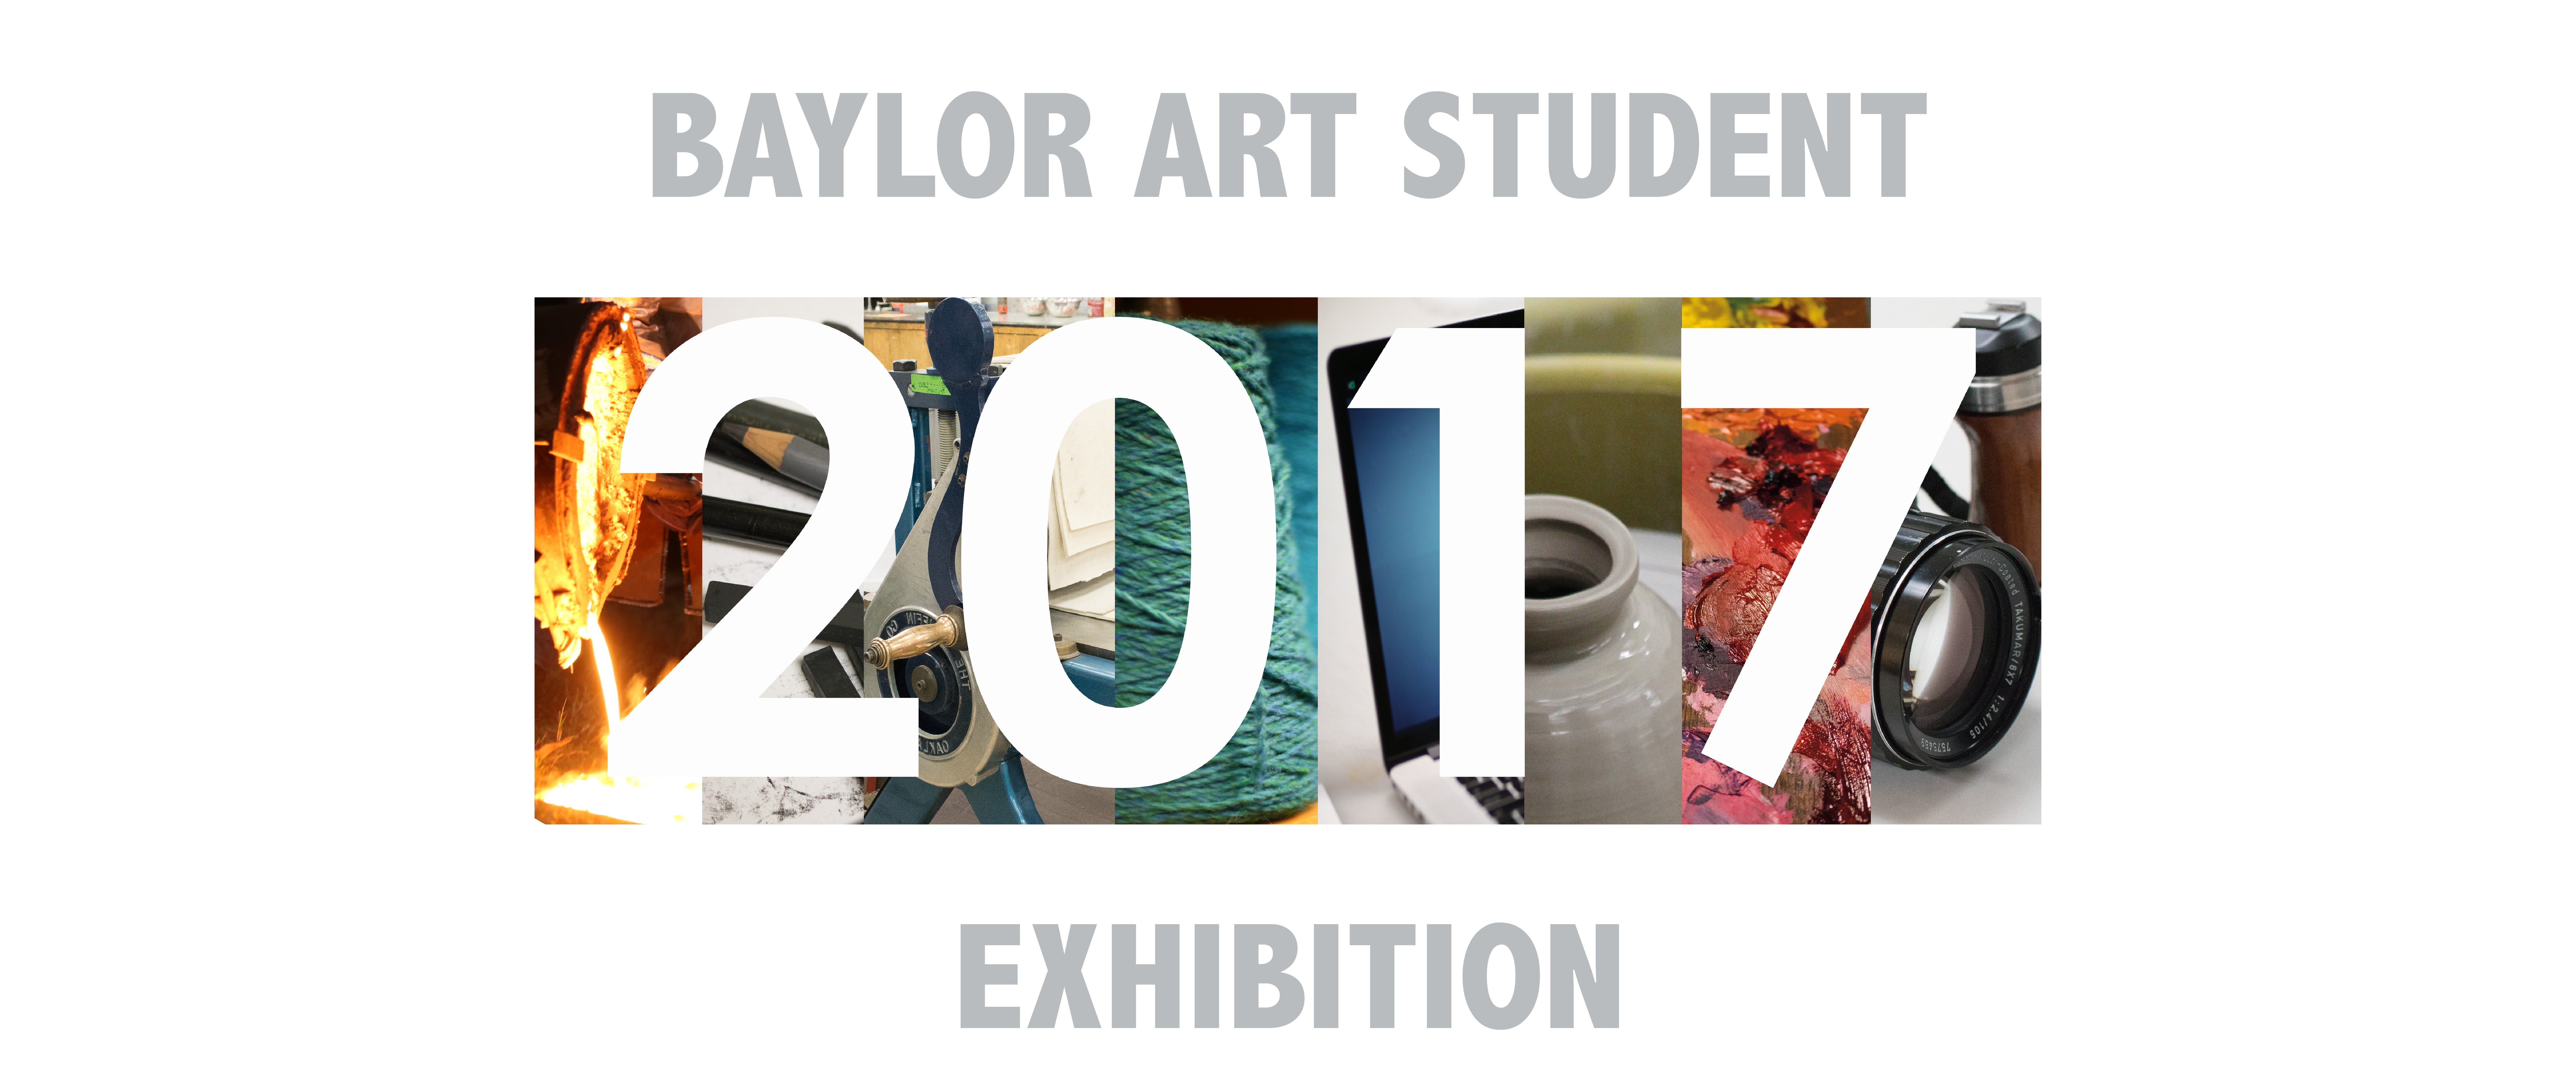 Student Exhibition 2017, web slide 1